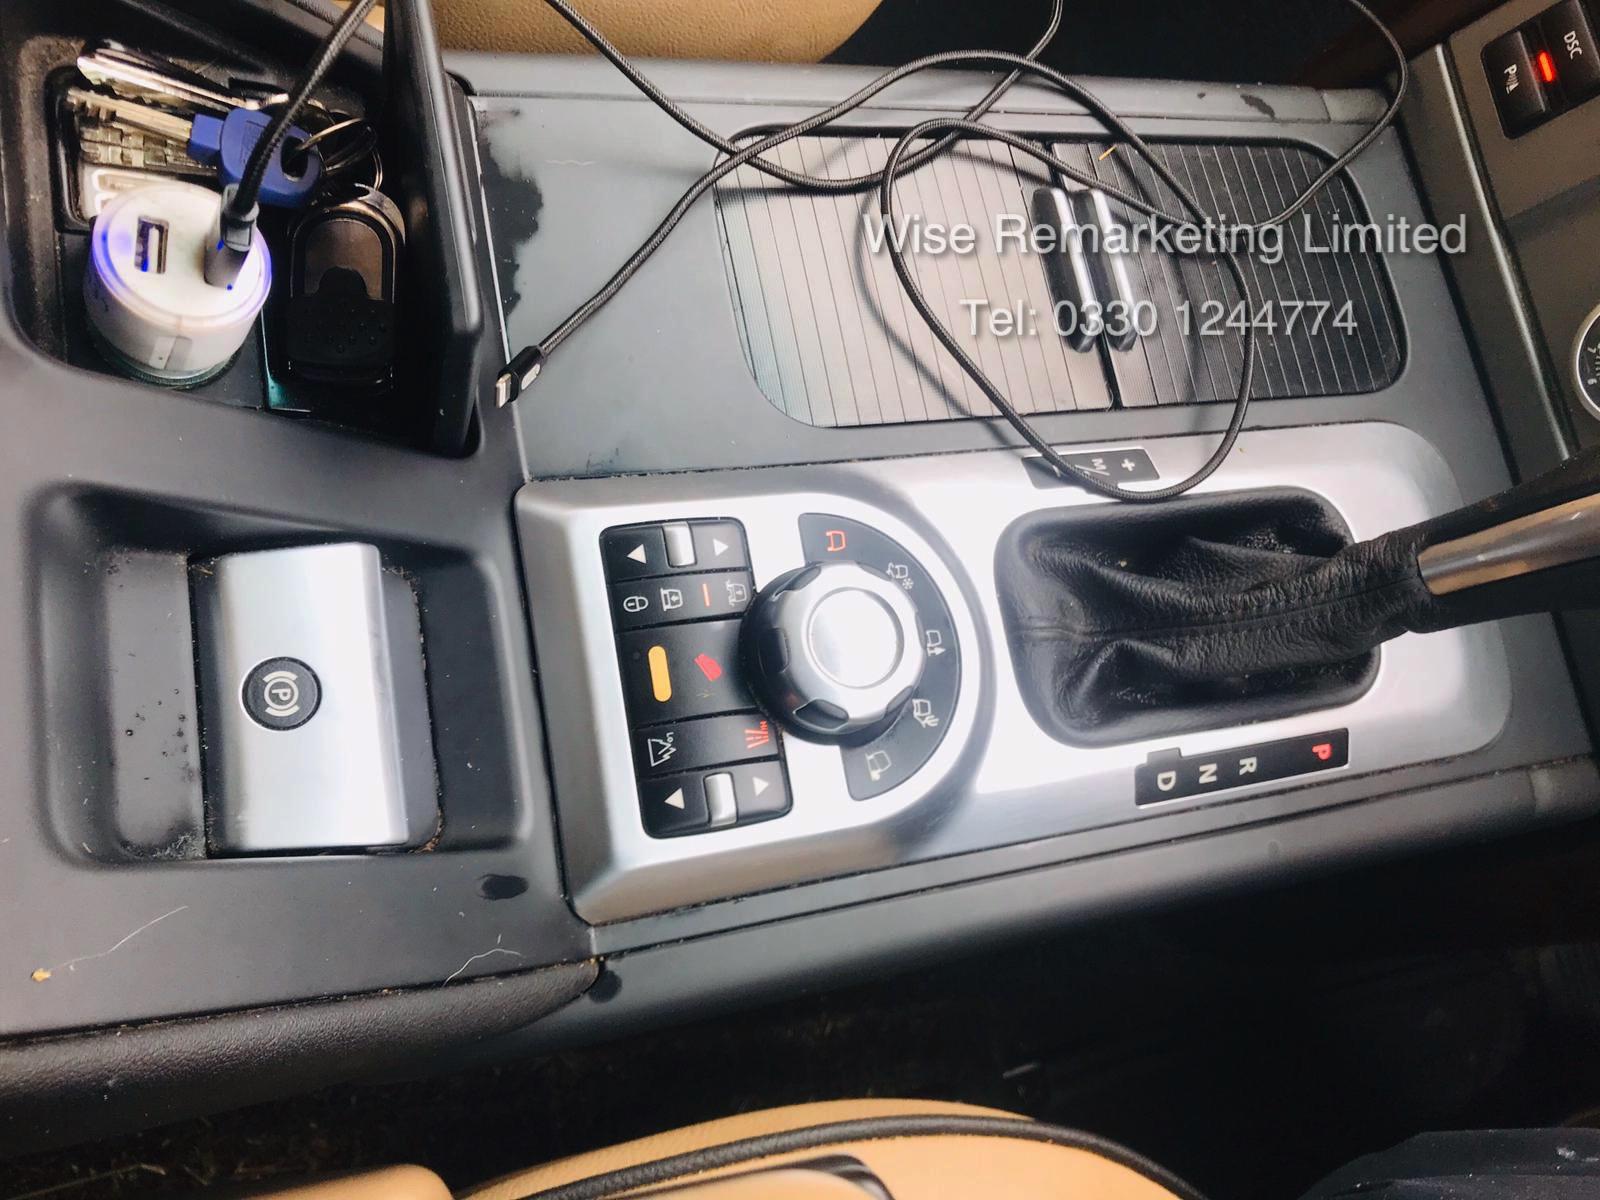 Range Rover Vogue 3.6 TDV8 HSE Auto - 2010 Model - Cream Leather - Service History - - Image 25 of 28